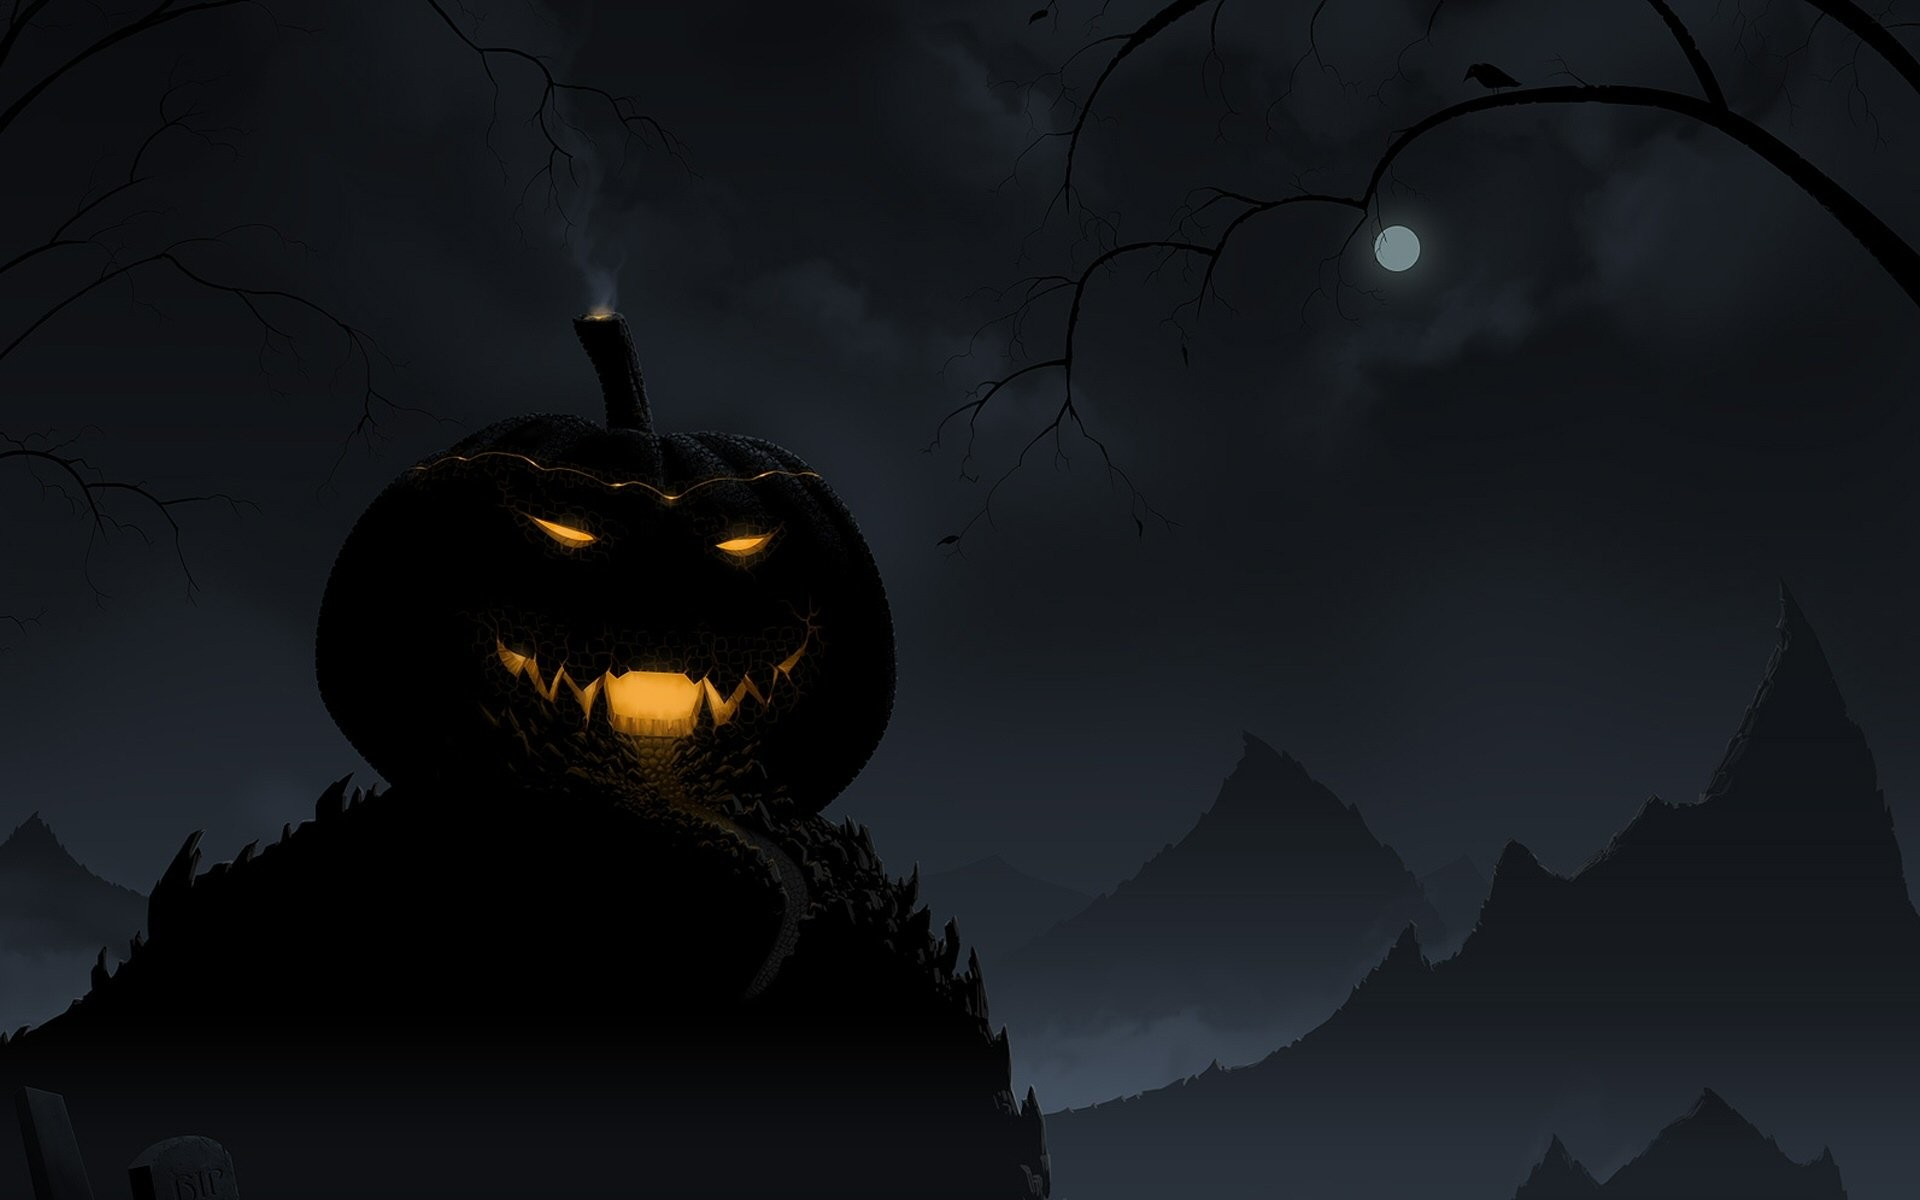 Halloween Spooky Wallpaper.Halloween Scary Wallpaper 64 Images